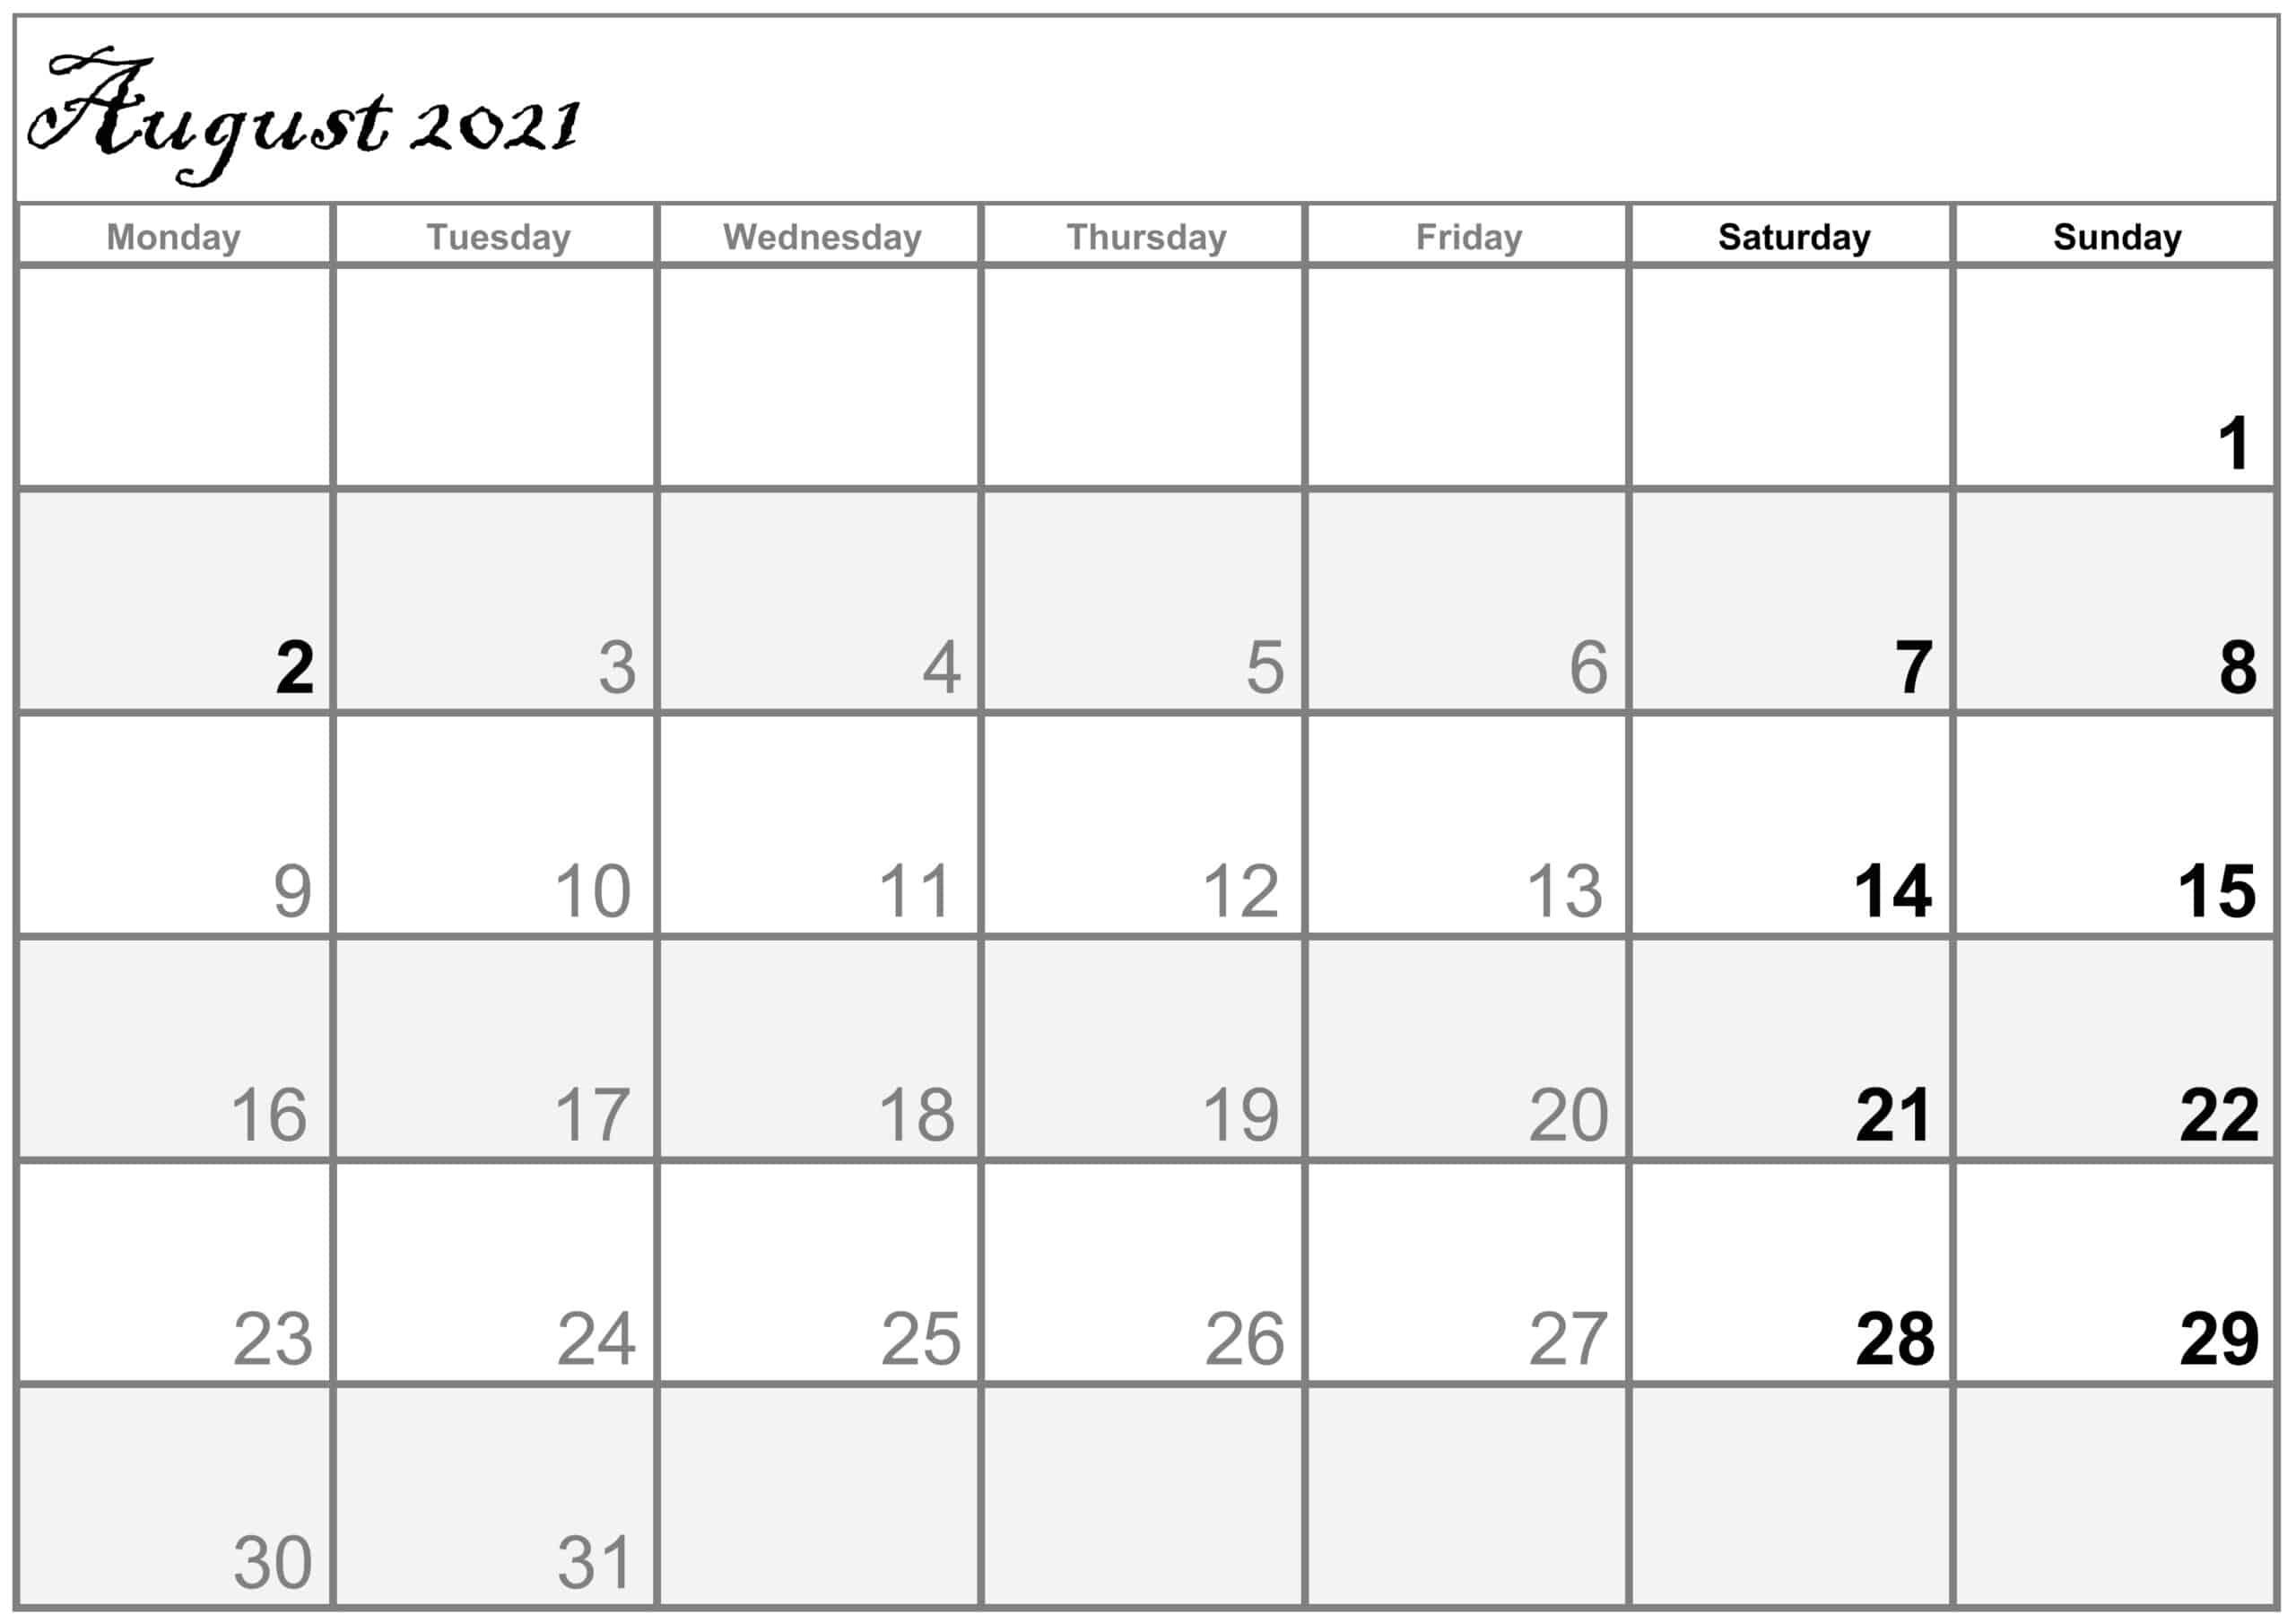 Excel August 2021 Calendar free